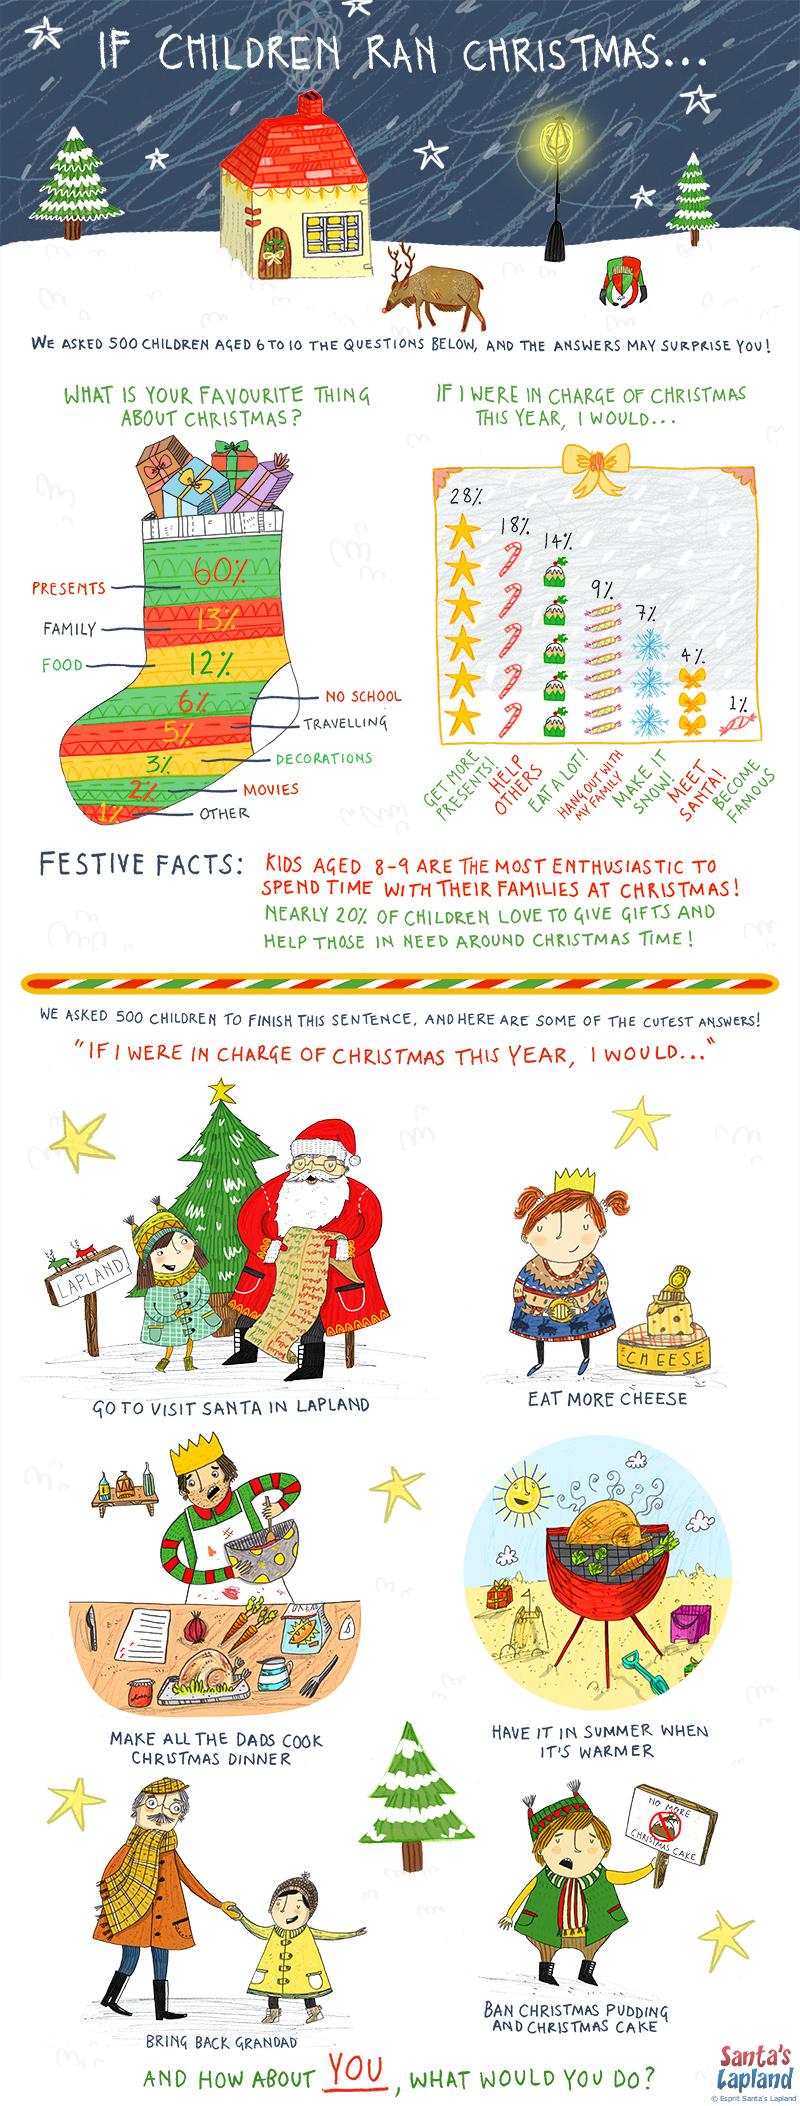 If Children Ran Christmas...